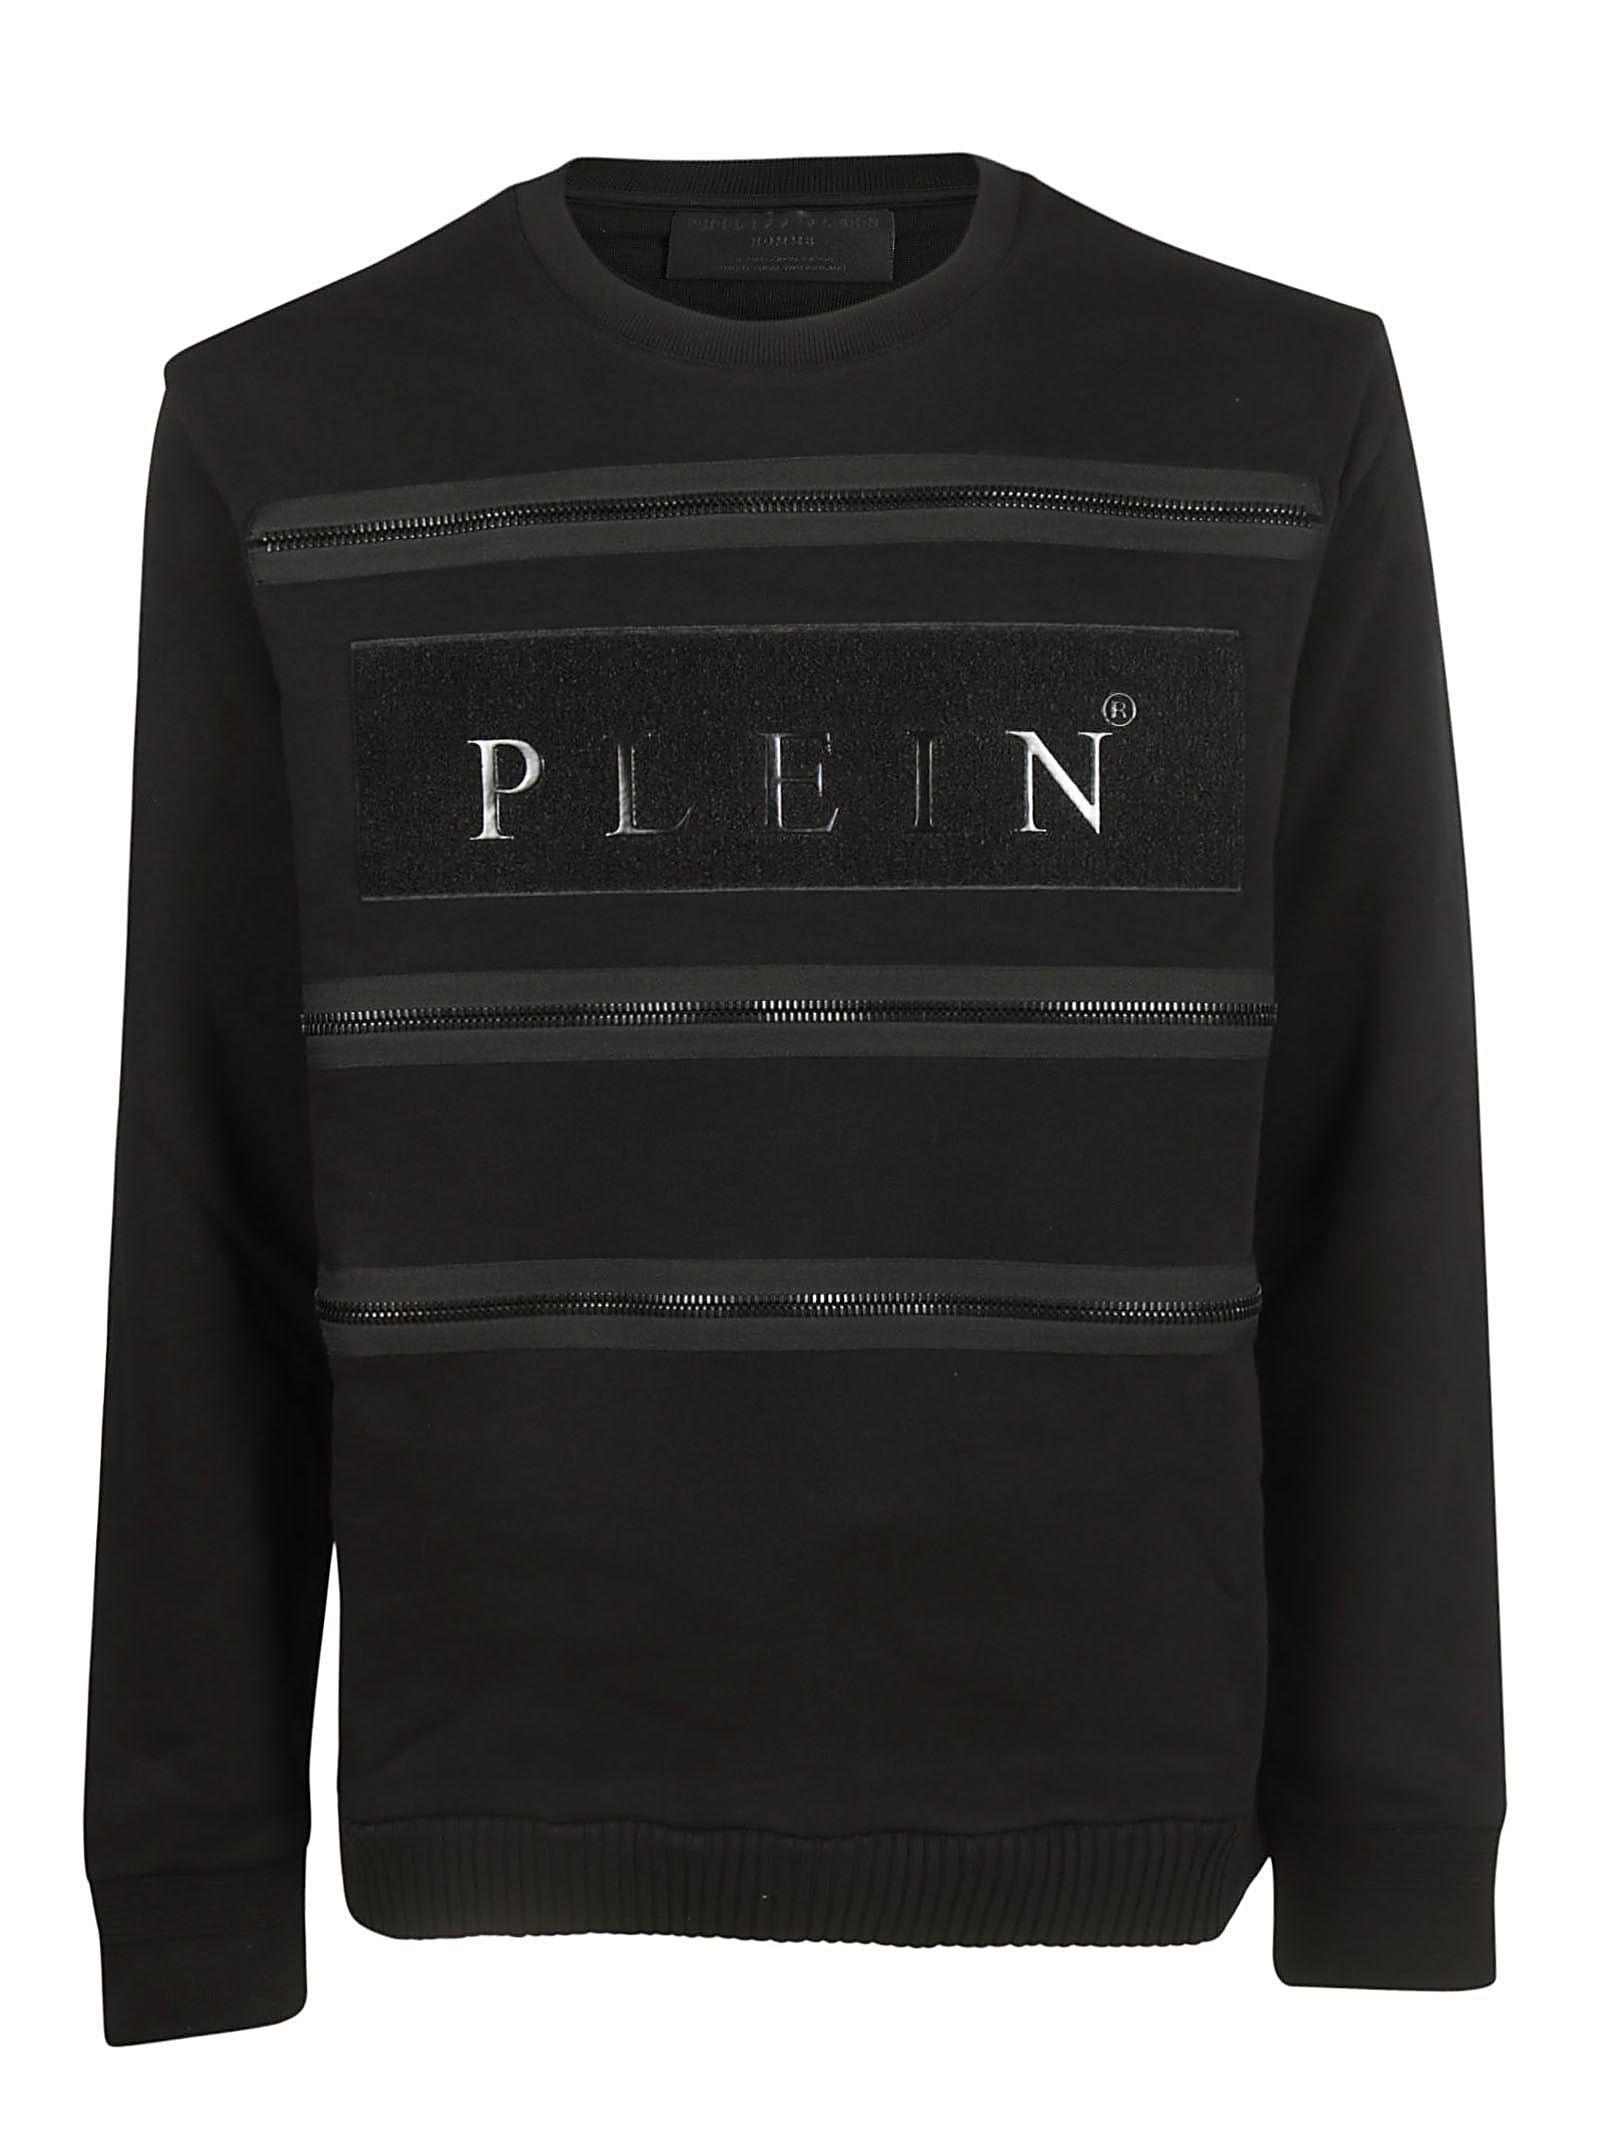 Philipp Plein Logo Sweatshirt In Black